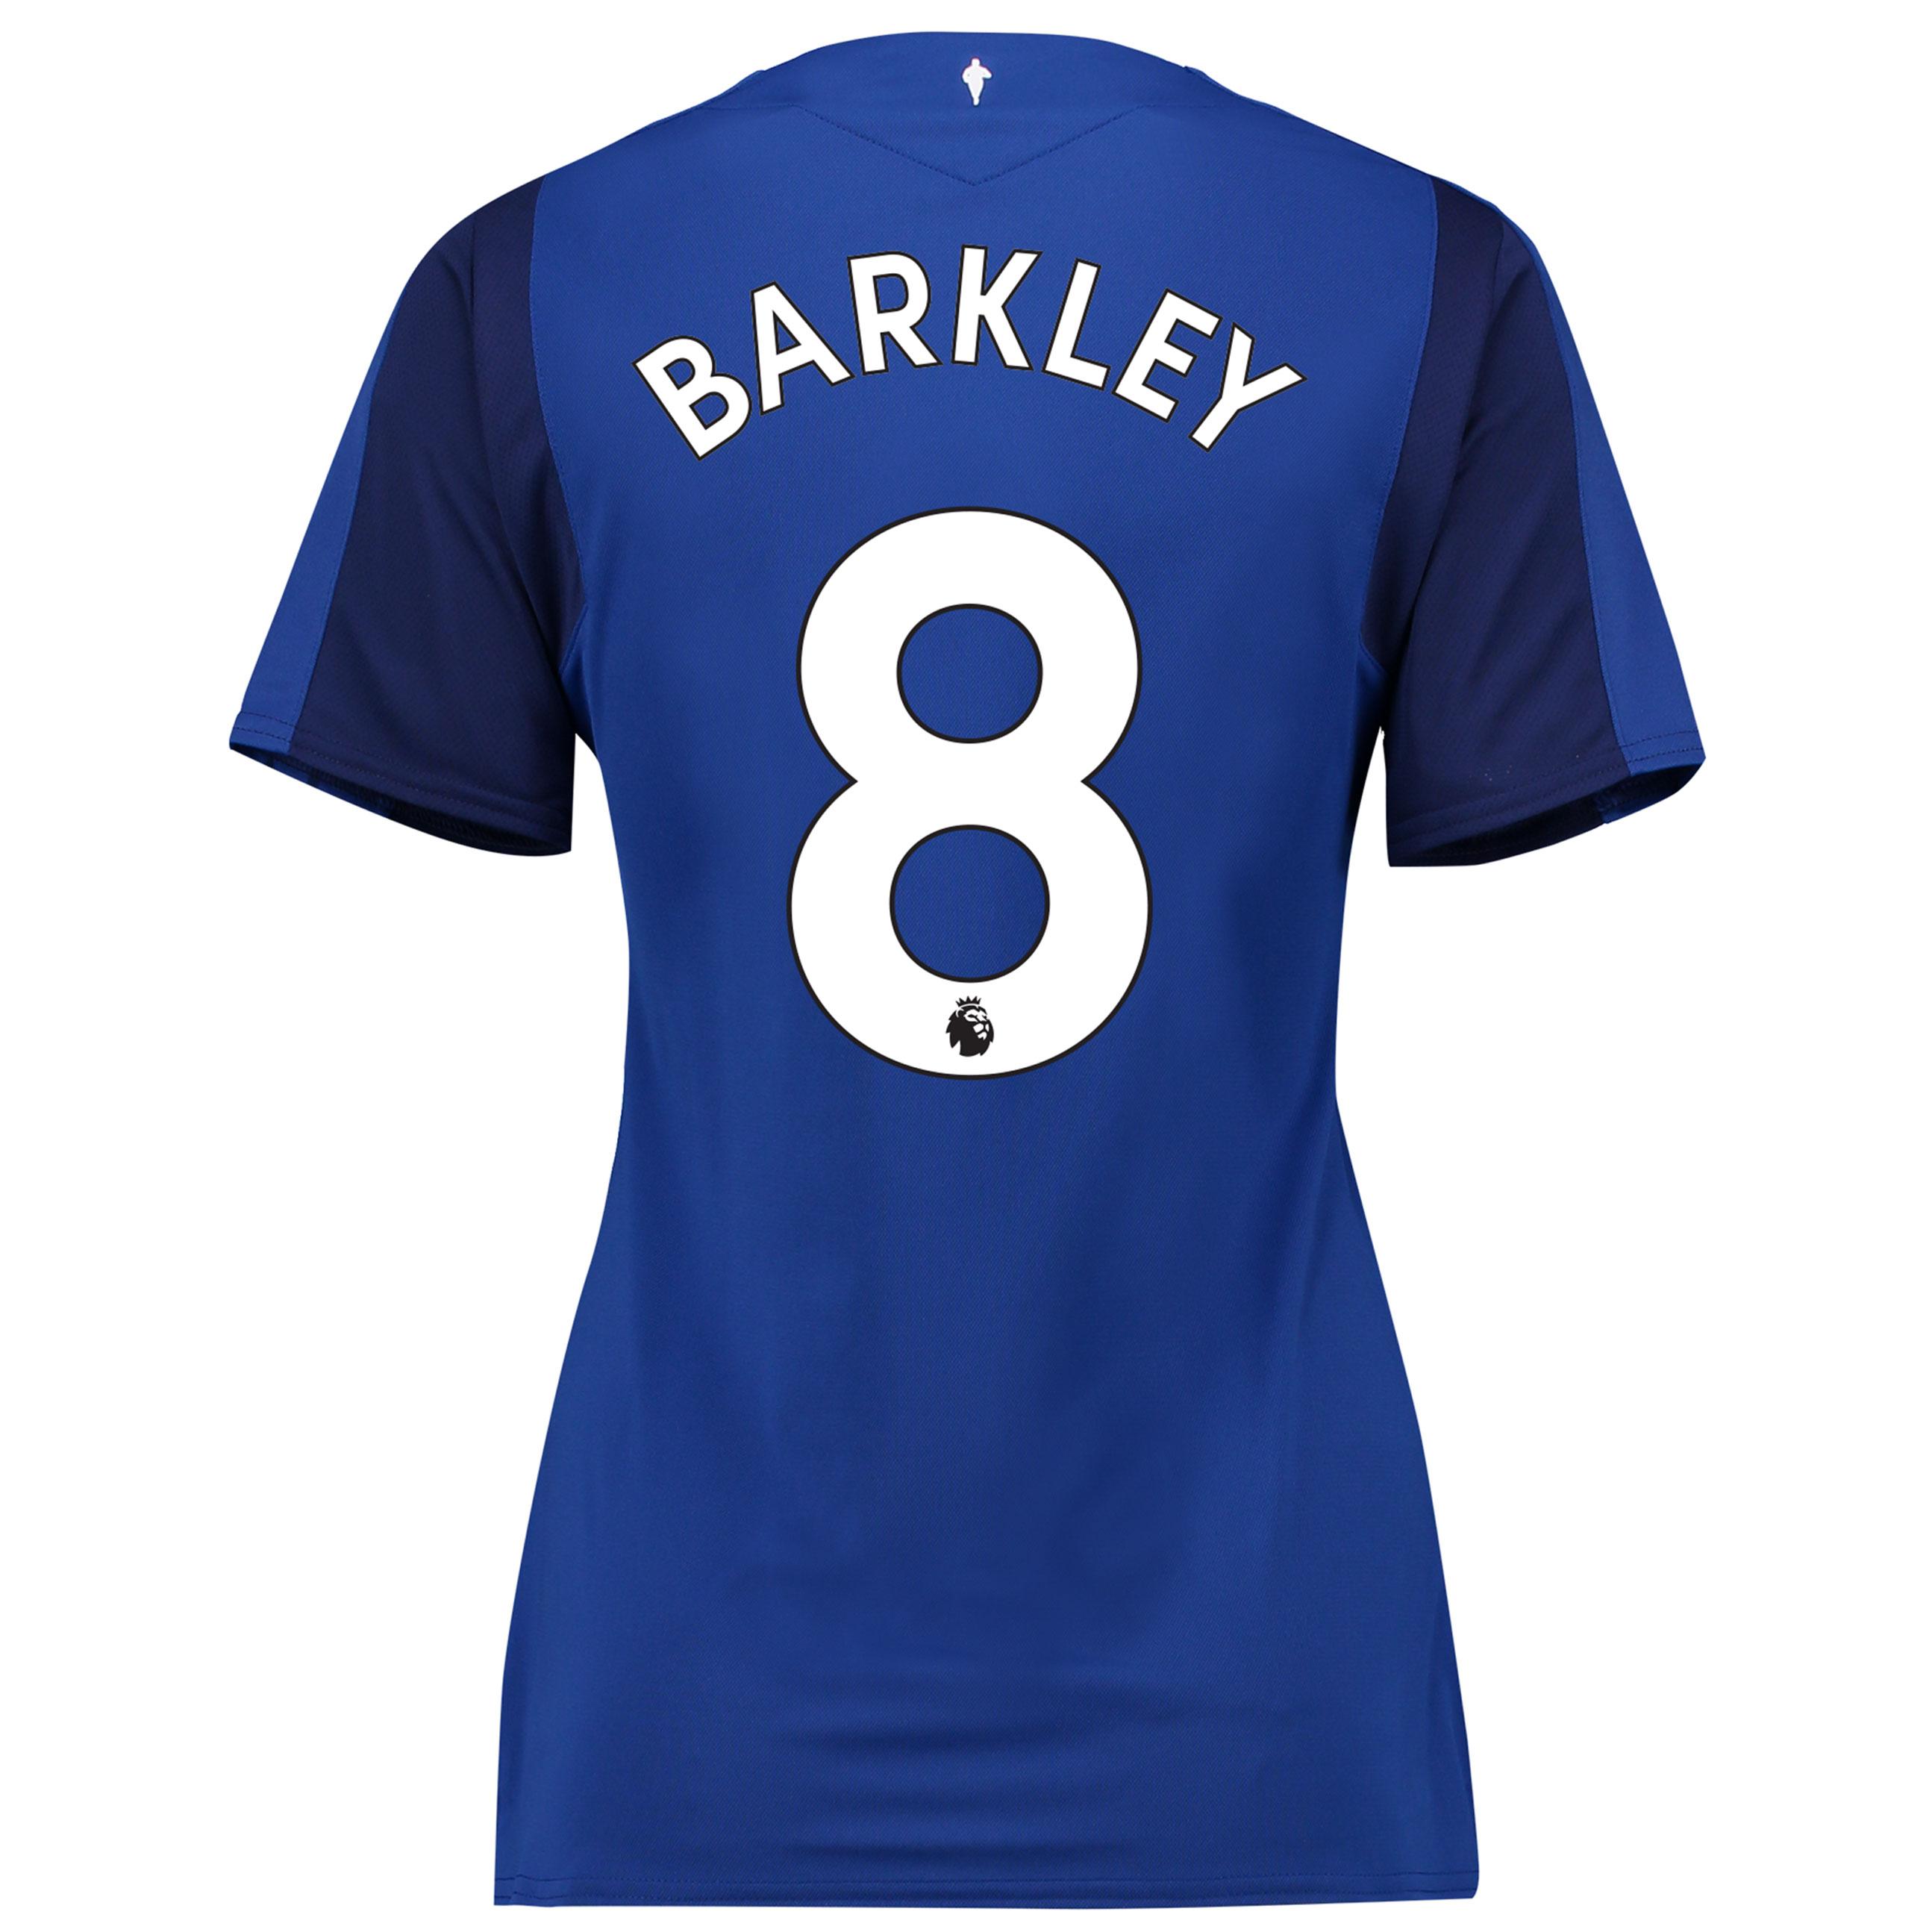 Everton Home Shirt 2017/18 - Womens with Barkley 8 printing